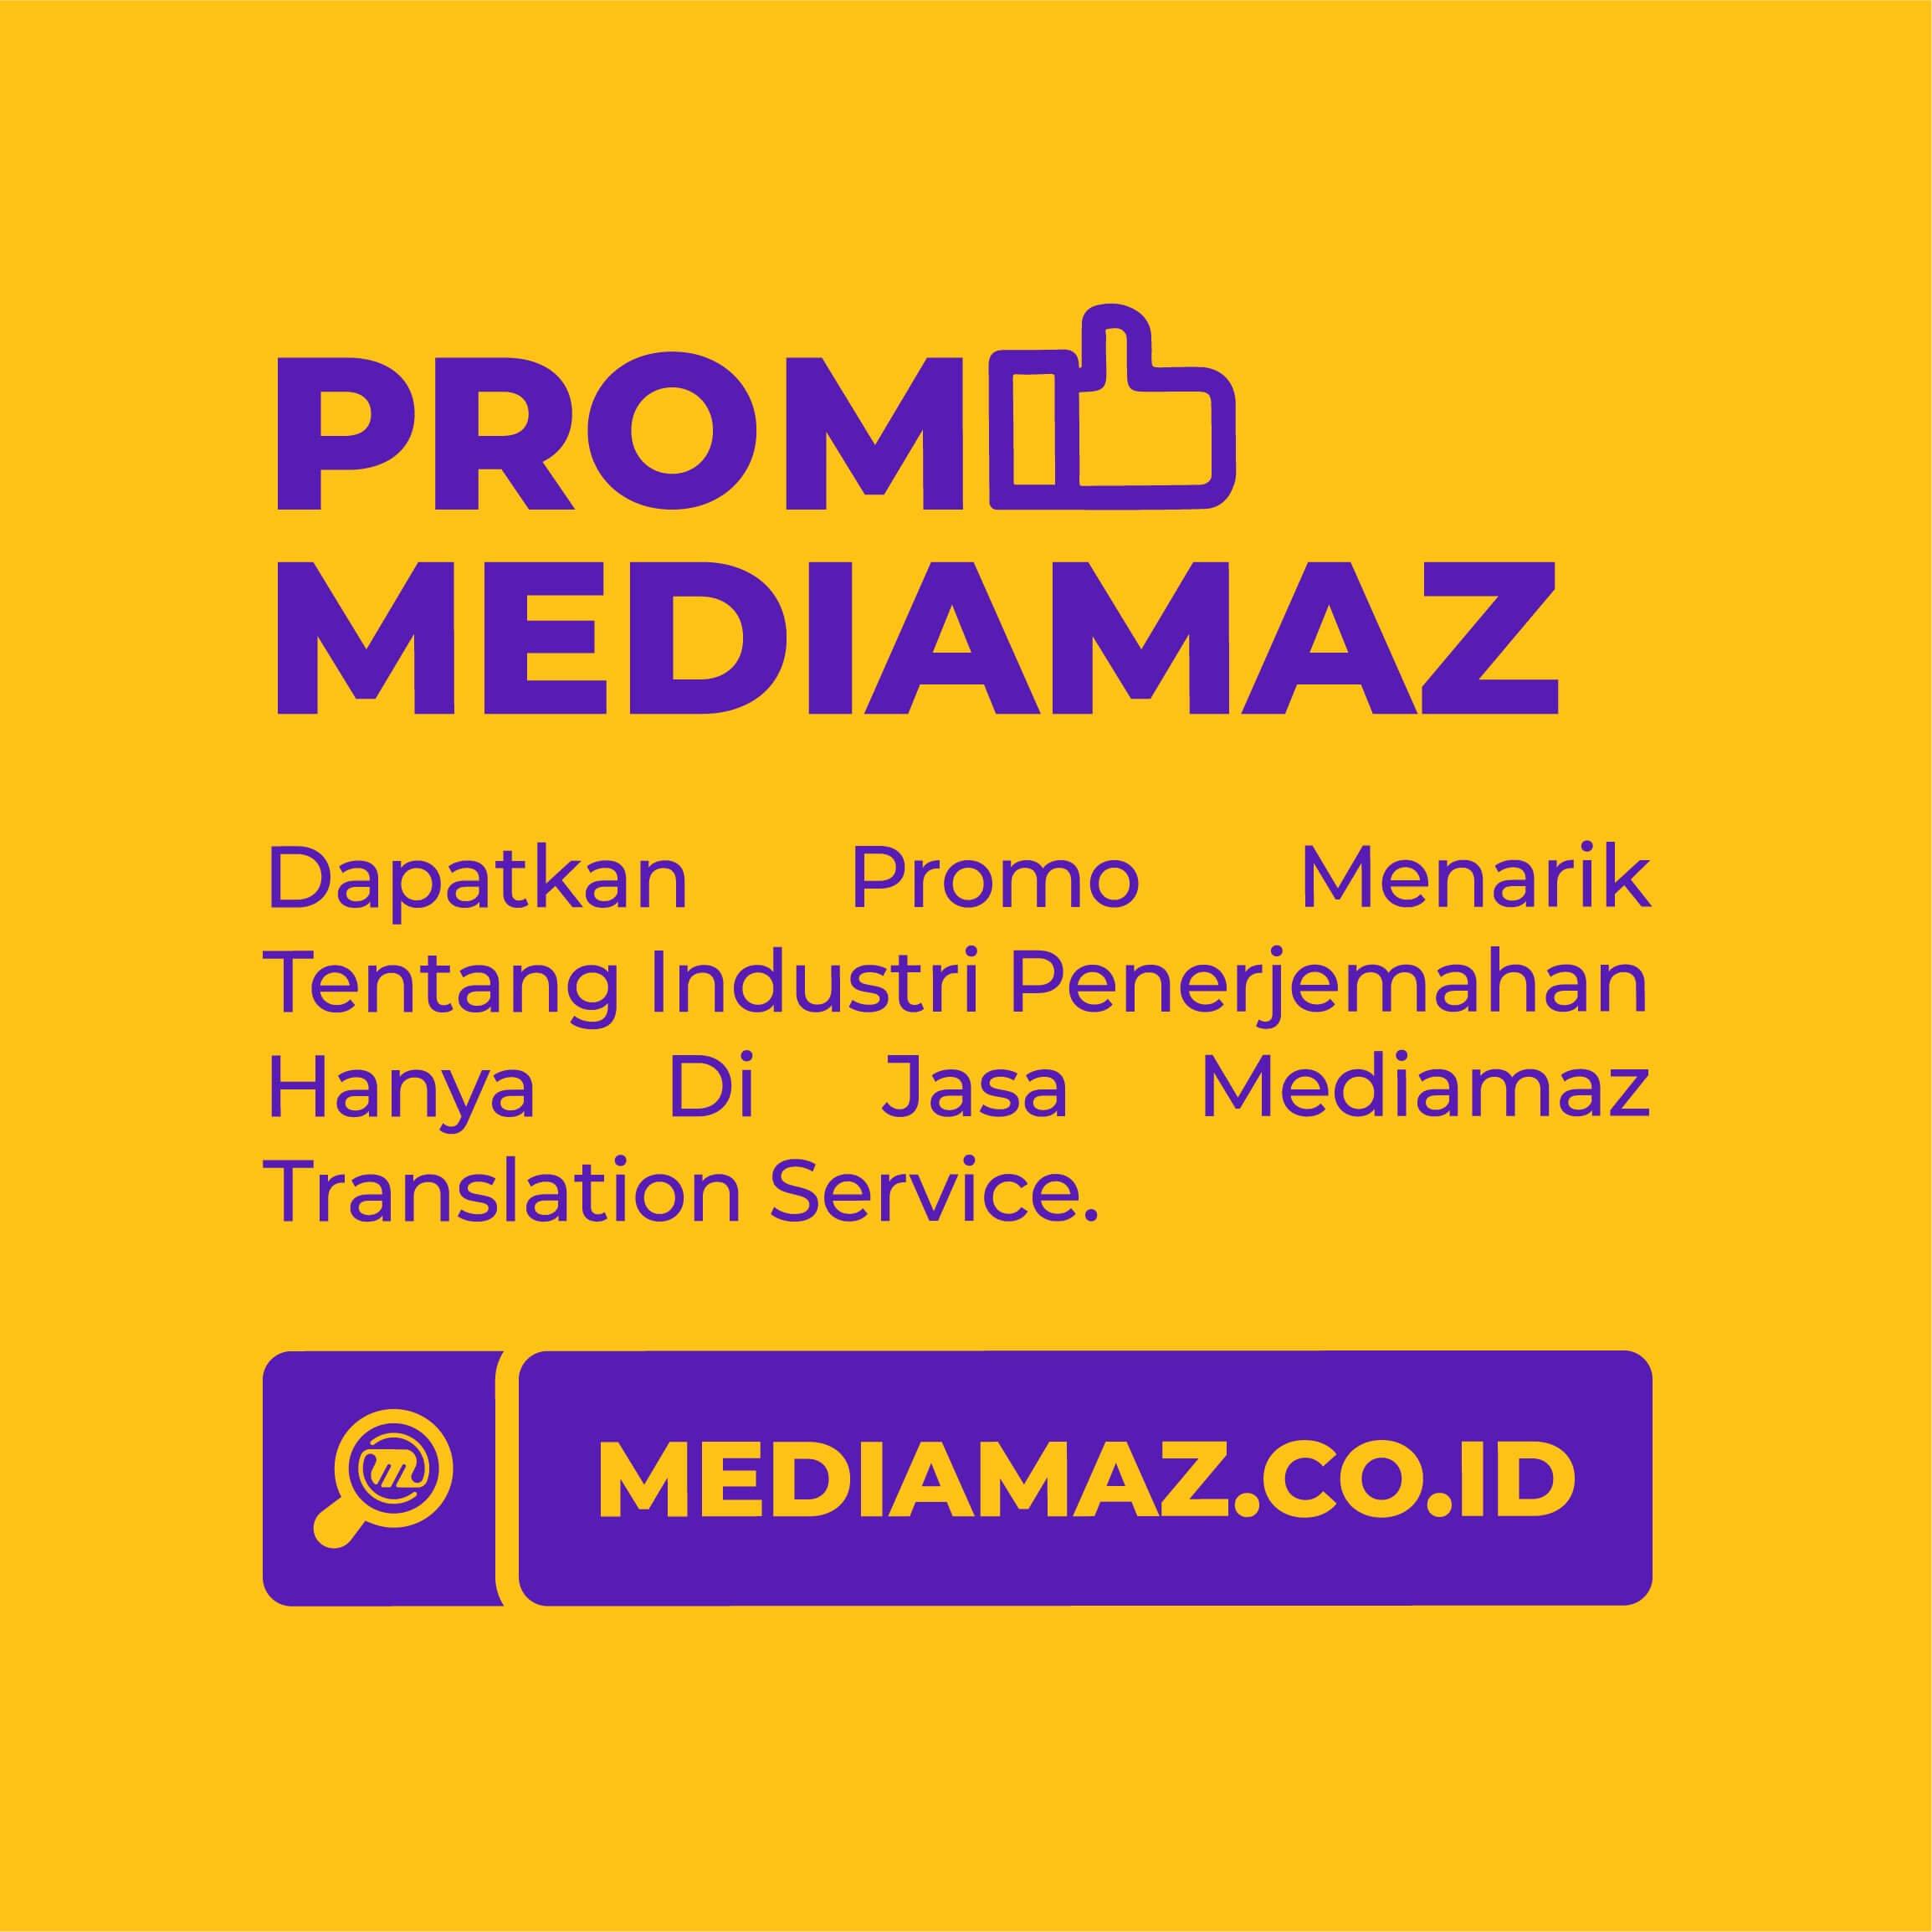 promo mediamaz ts